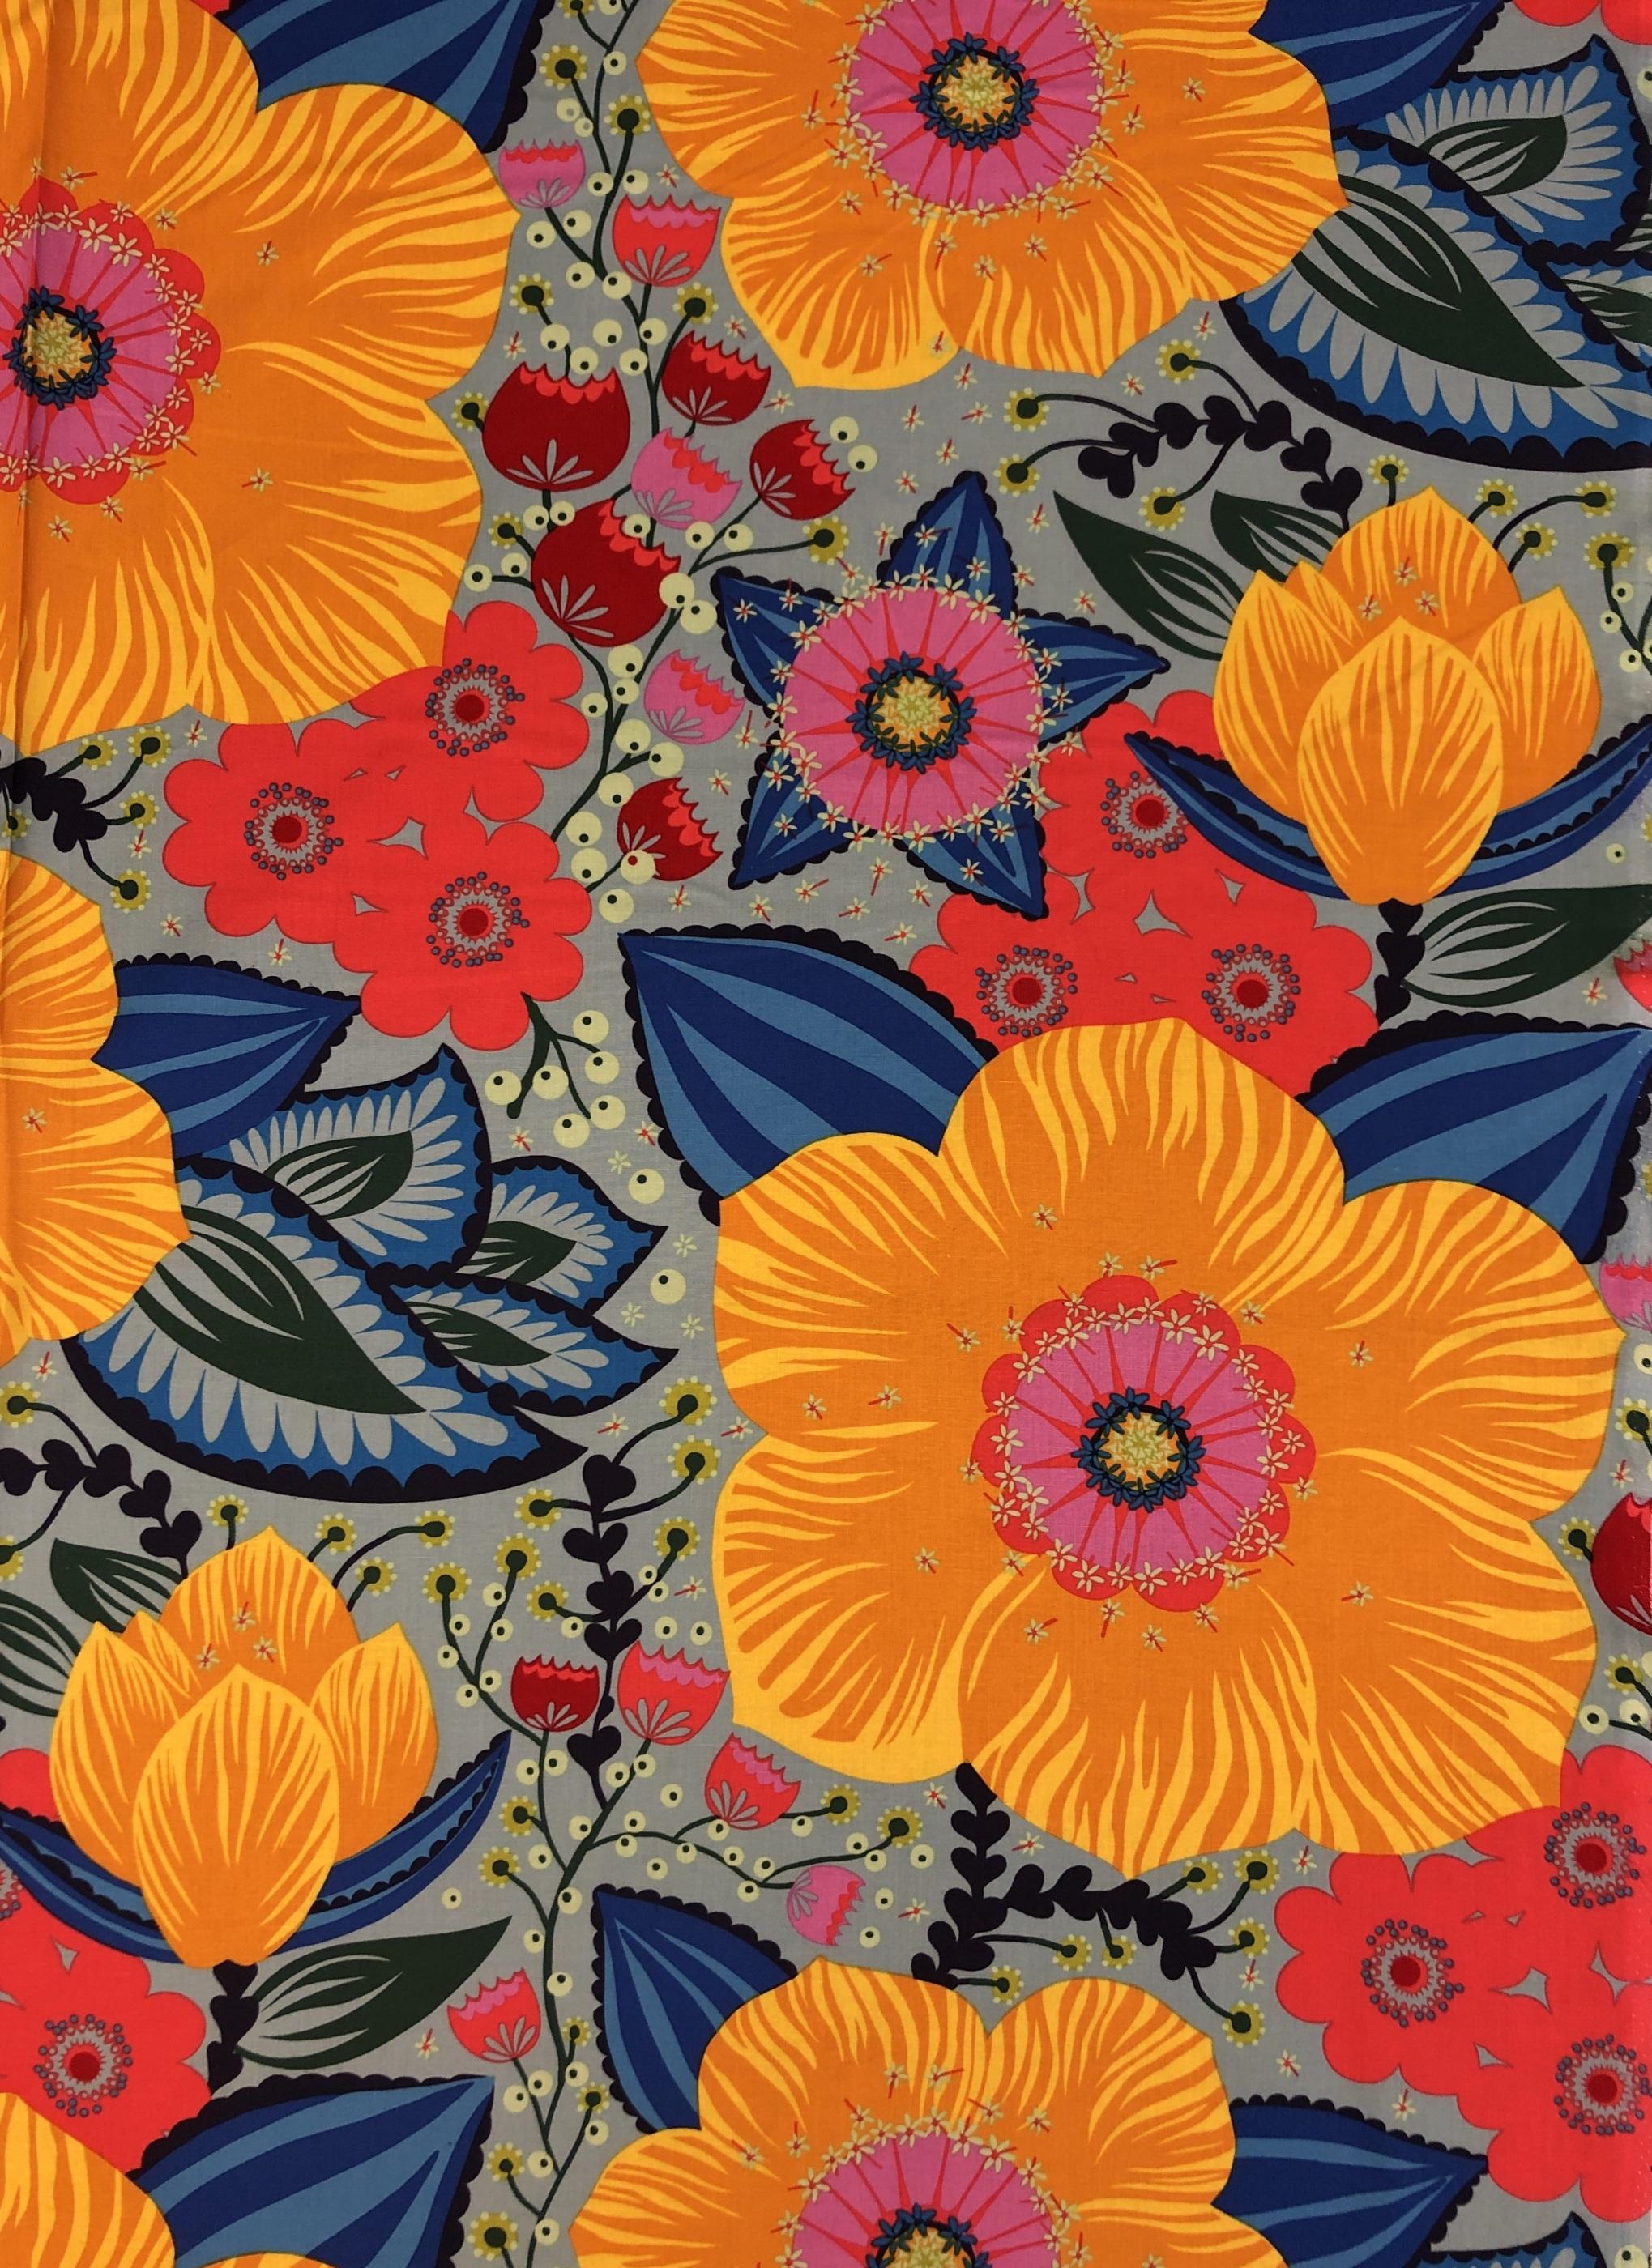 Flora blommor blommigt storblommigt grön blå rosa orange gul bomull metervara bomullsväv tyglust laholm